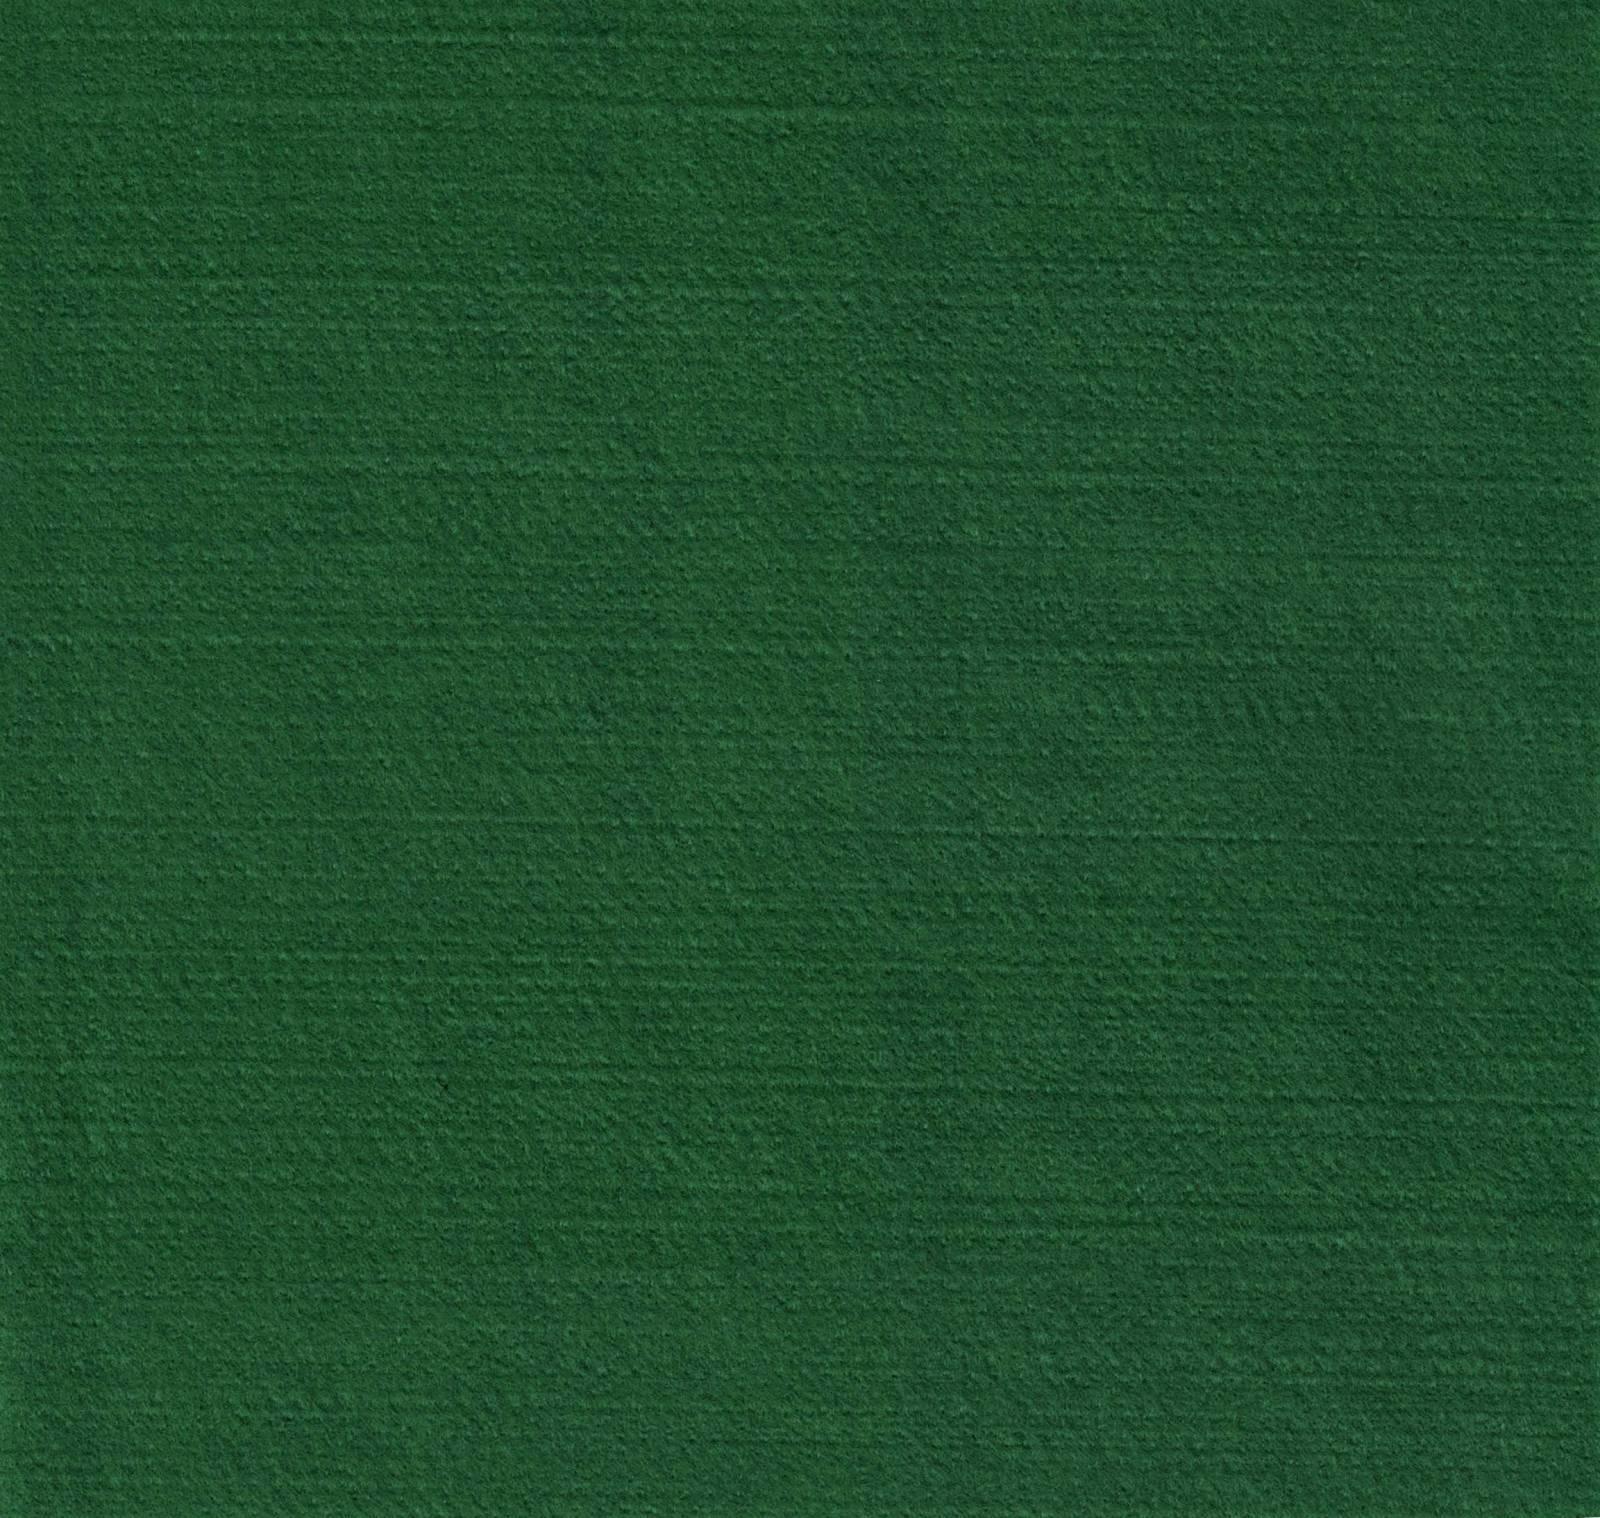 Feltro Santa fé verde bilhar Ref.003 - Armarinhos Nodari